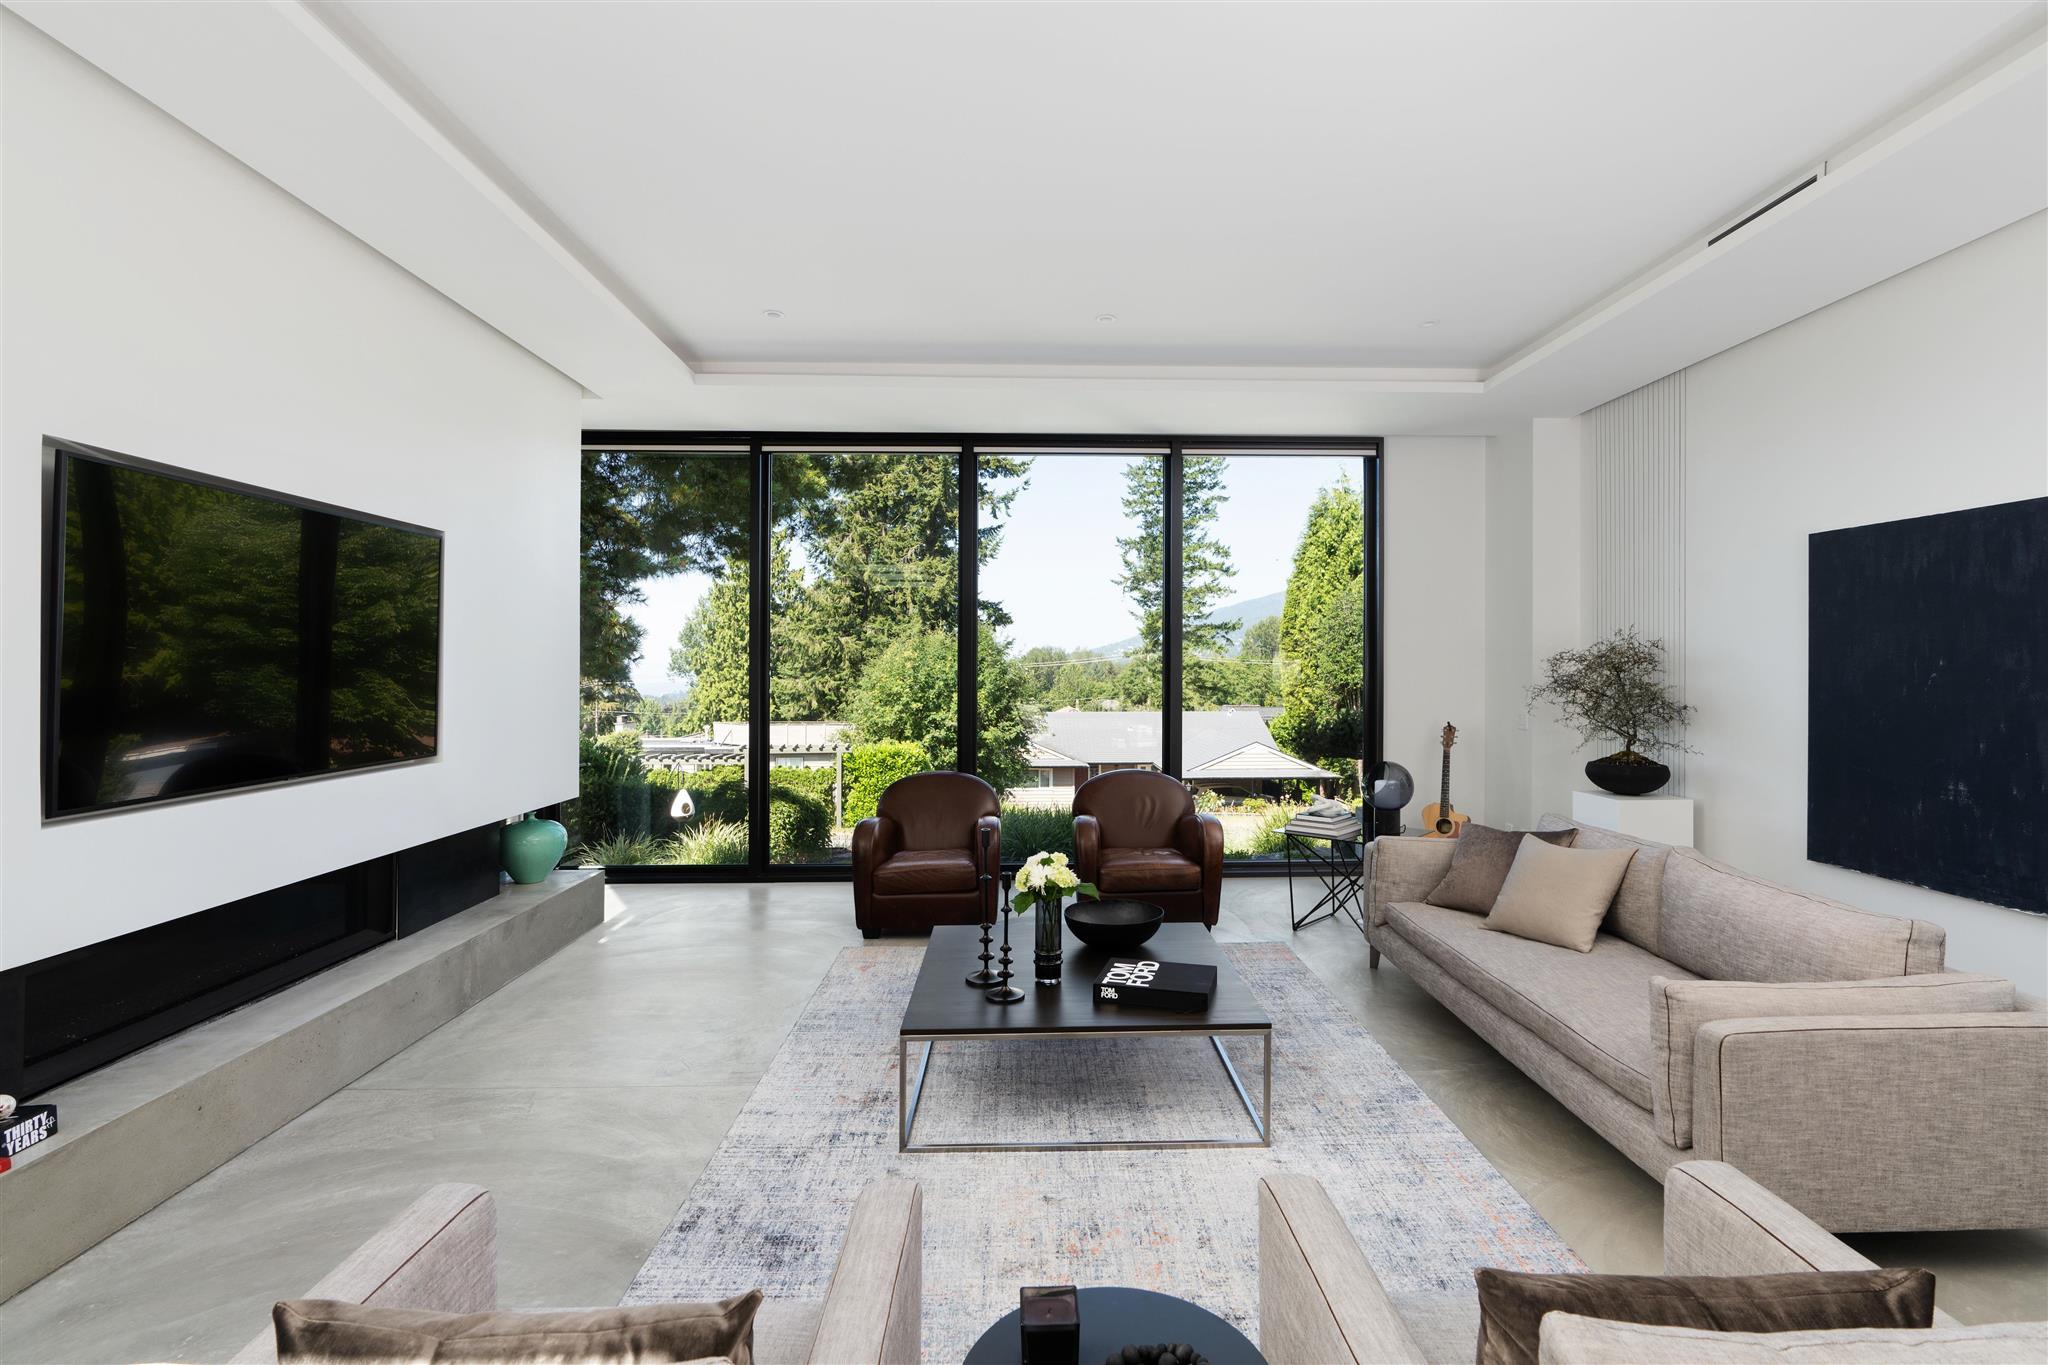 276 SANDRINGHAM CRESCENT - Upper Lonsdale House/Single Family for sale, 7 Bedrooms (R2617703) - #9